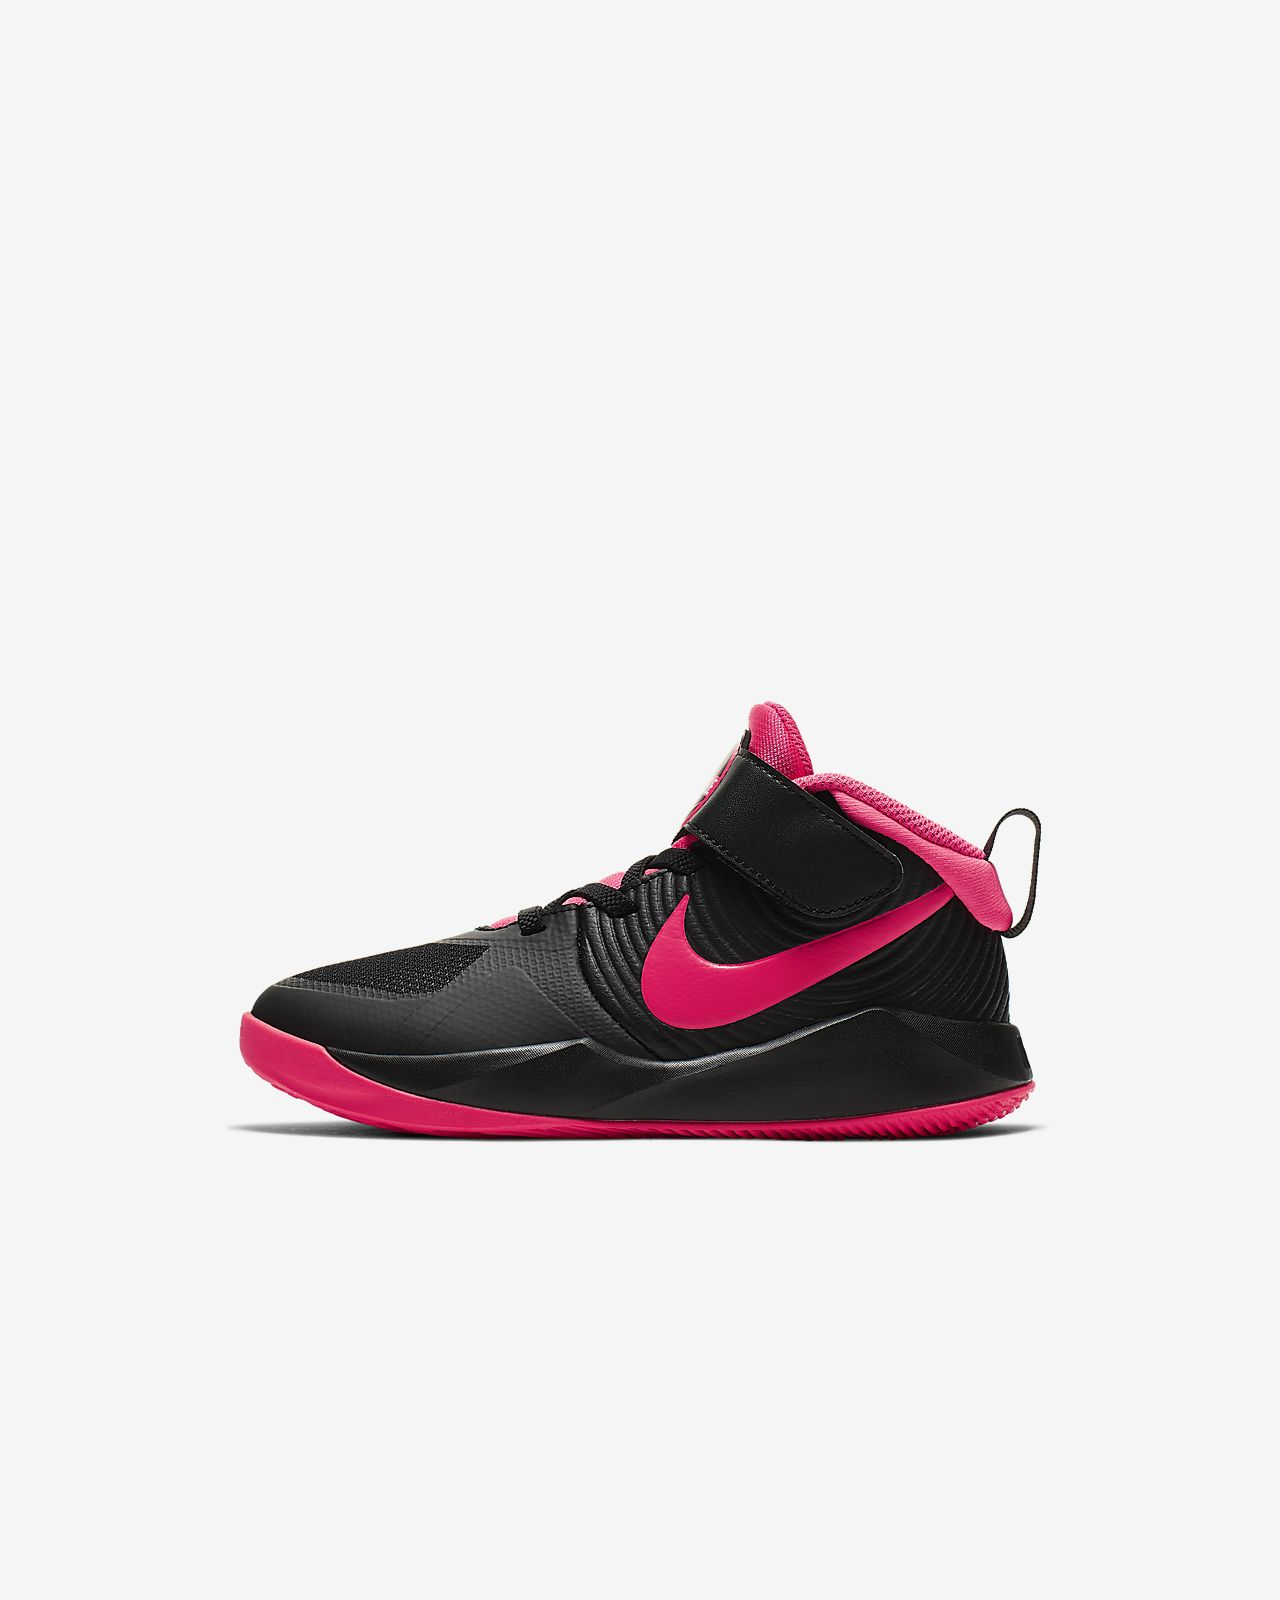 Nike Team Hustle D 9 (PS) 幼童运动童鞋